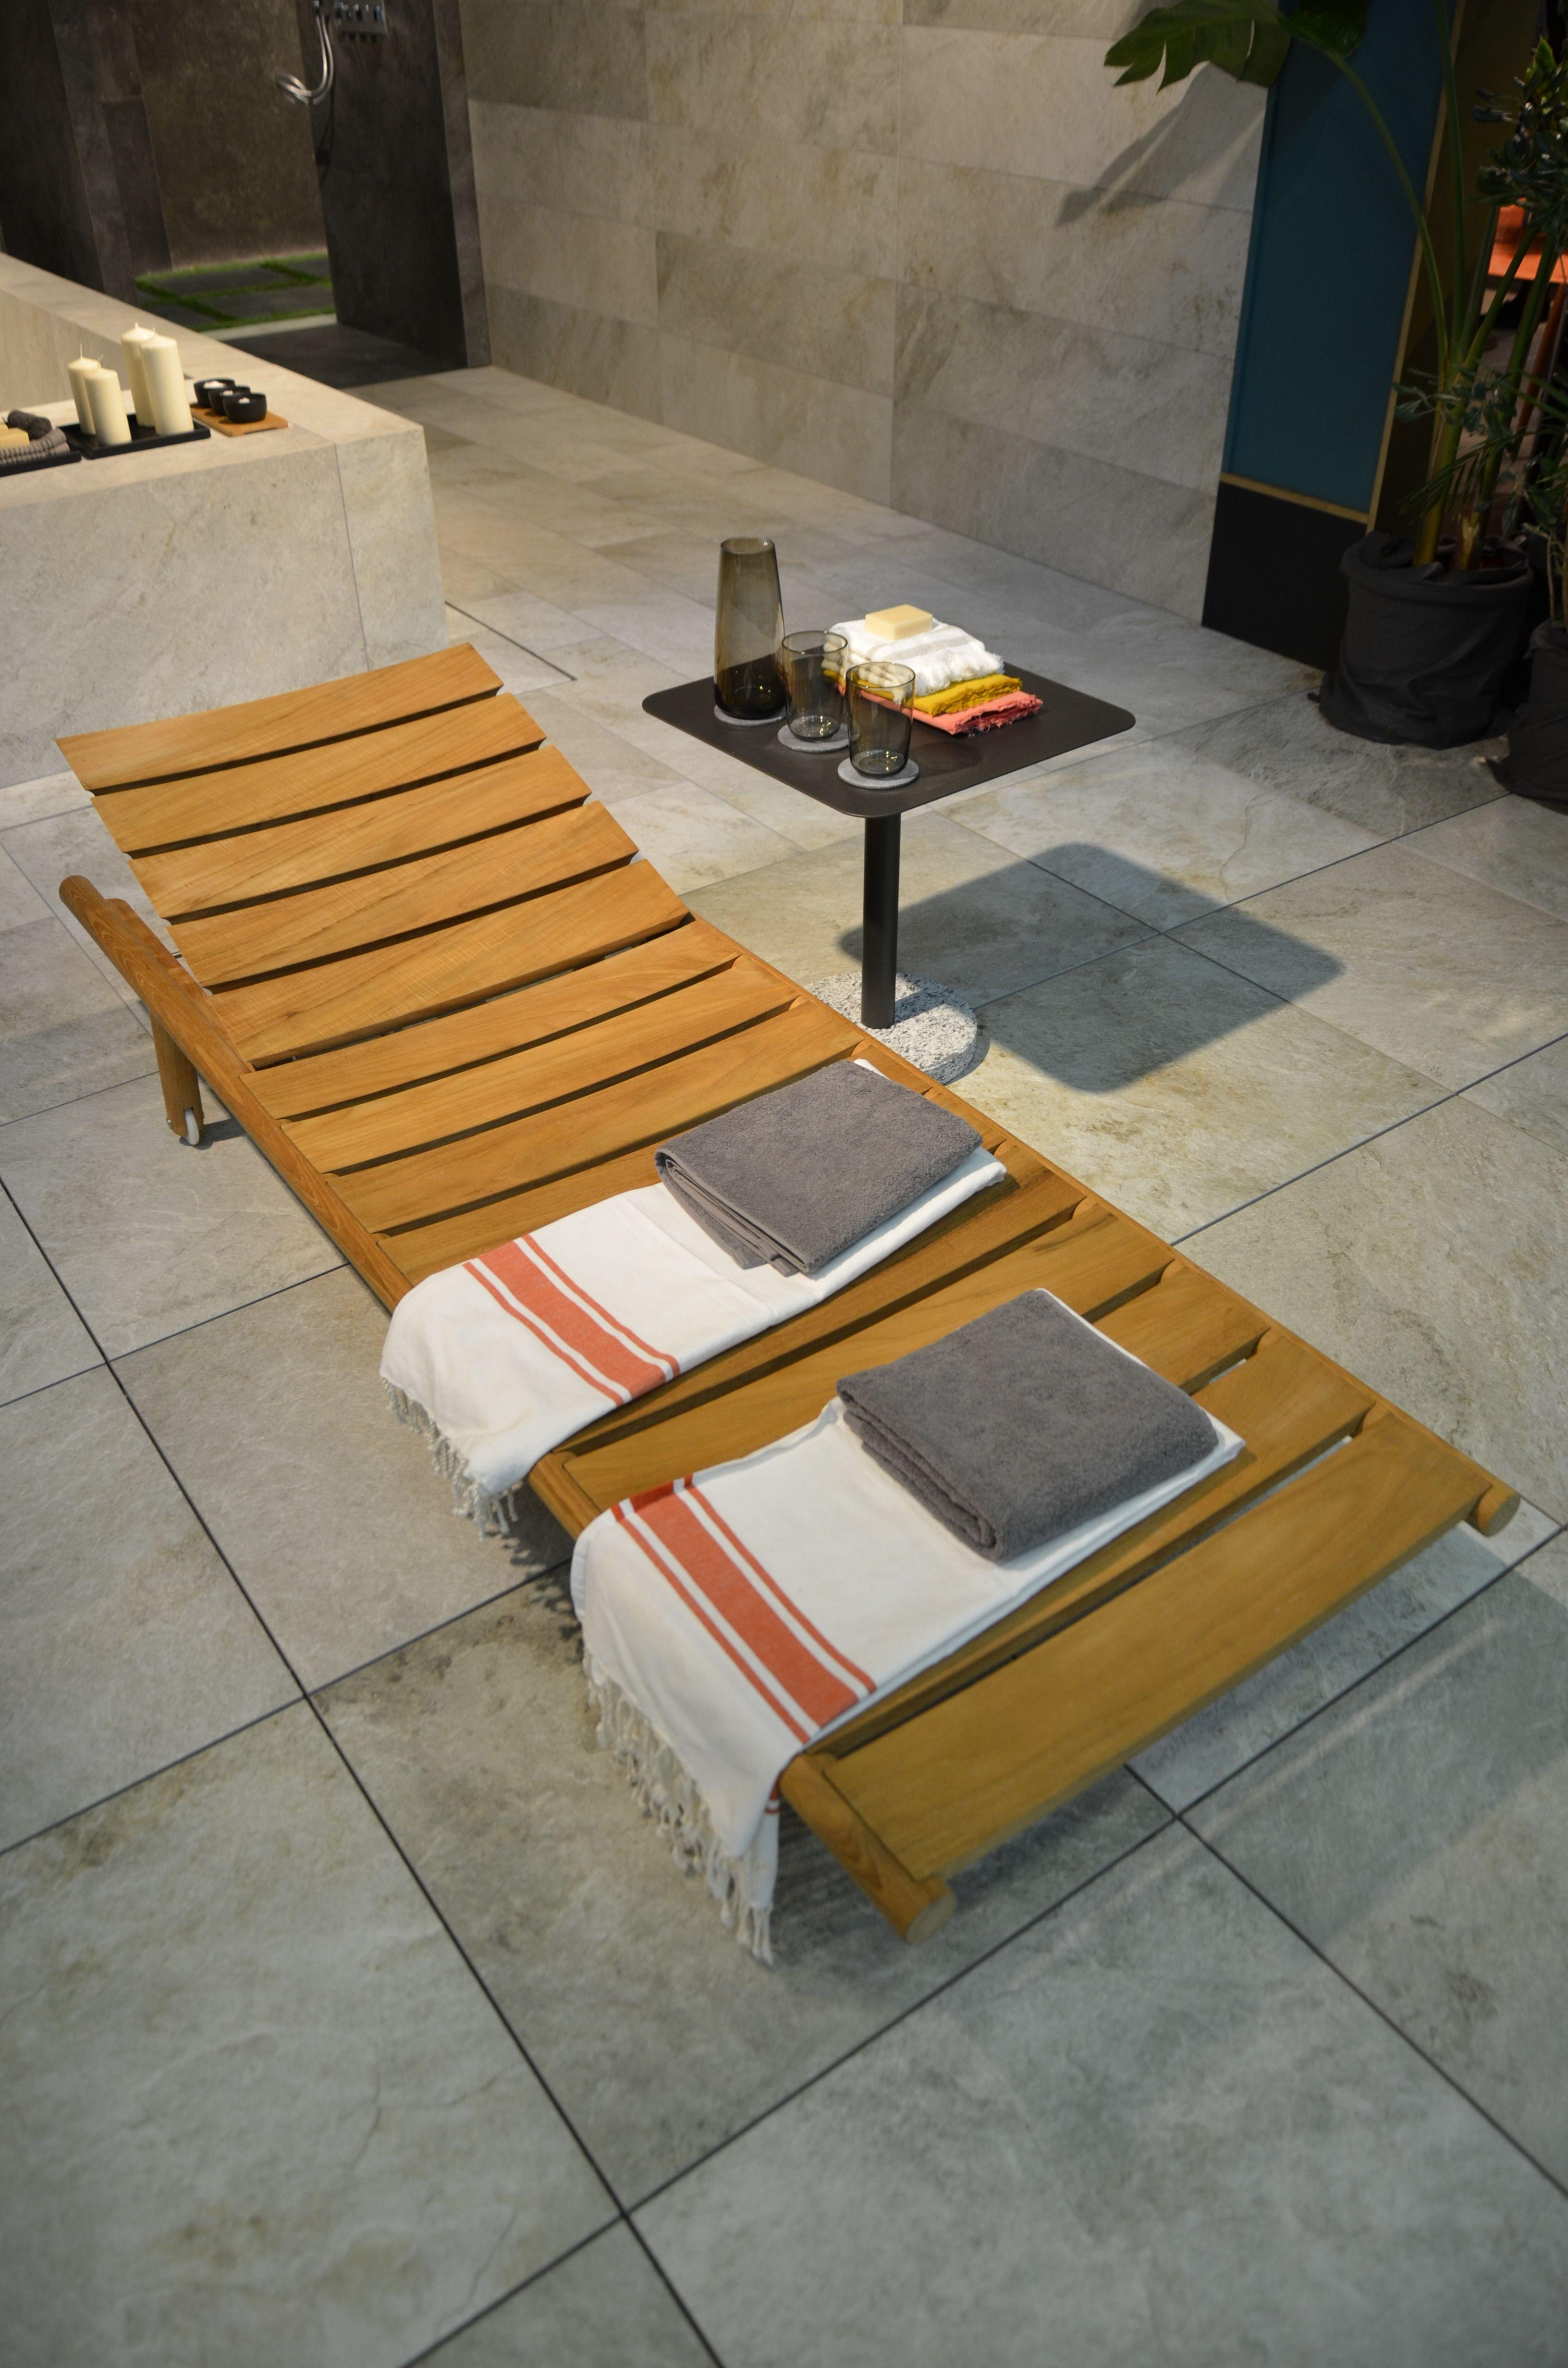 tolles linea terrassenplatten eingebung images oder eeadefeba